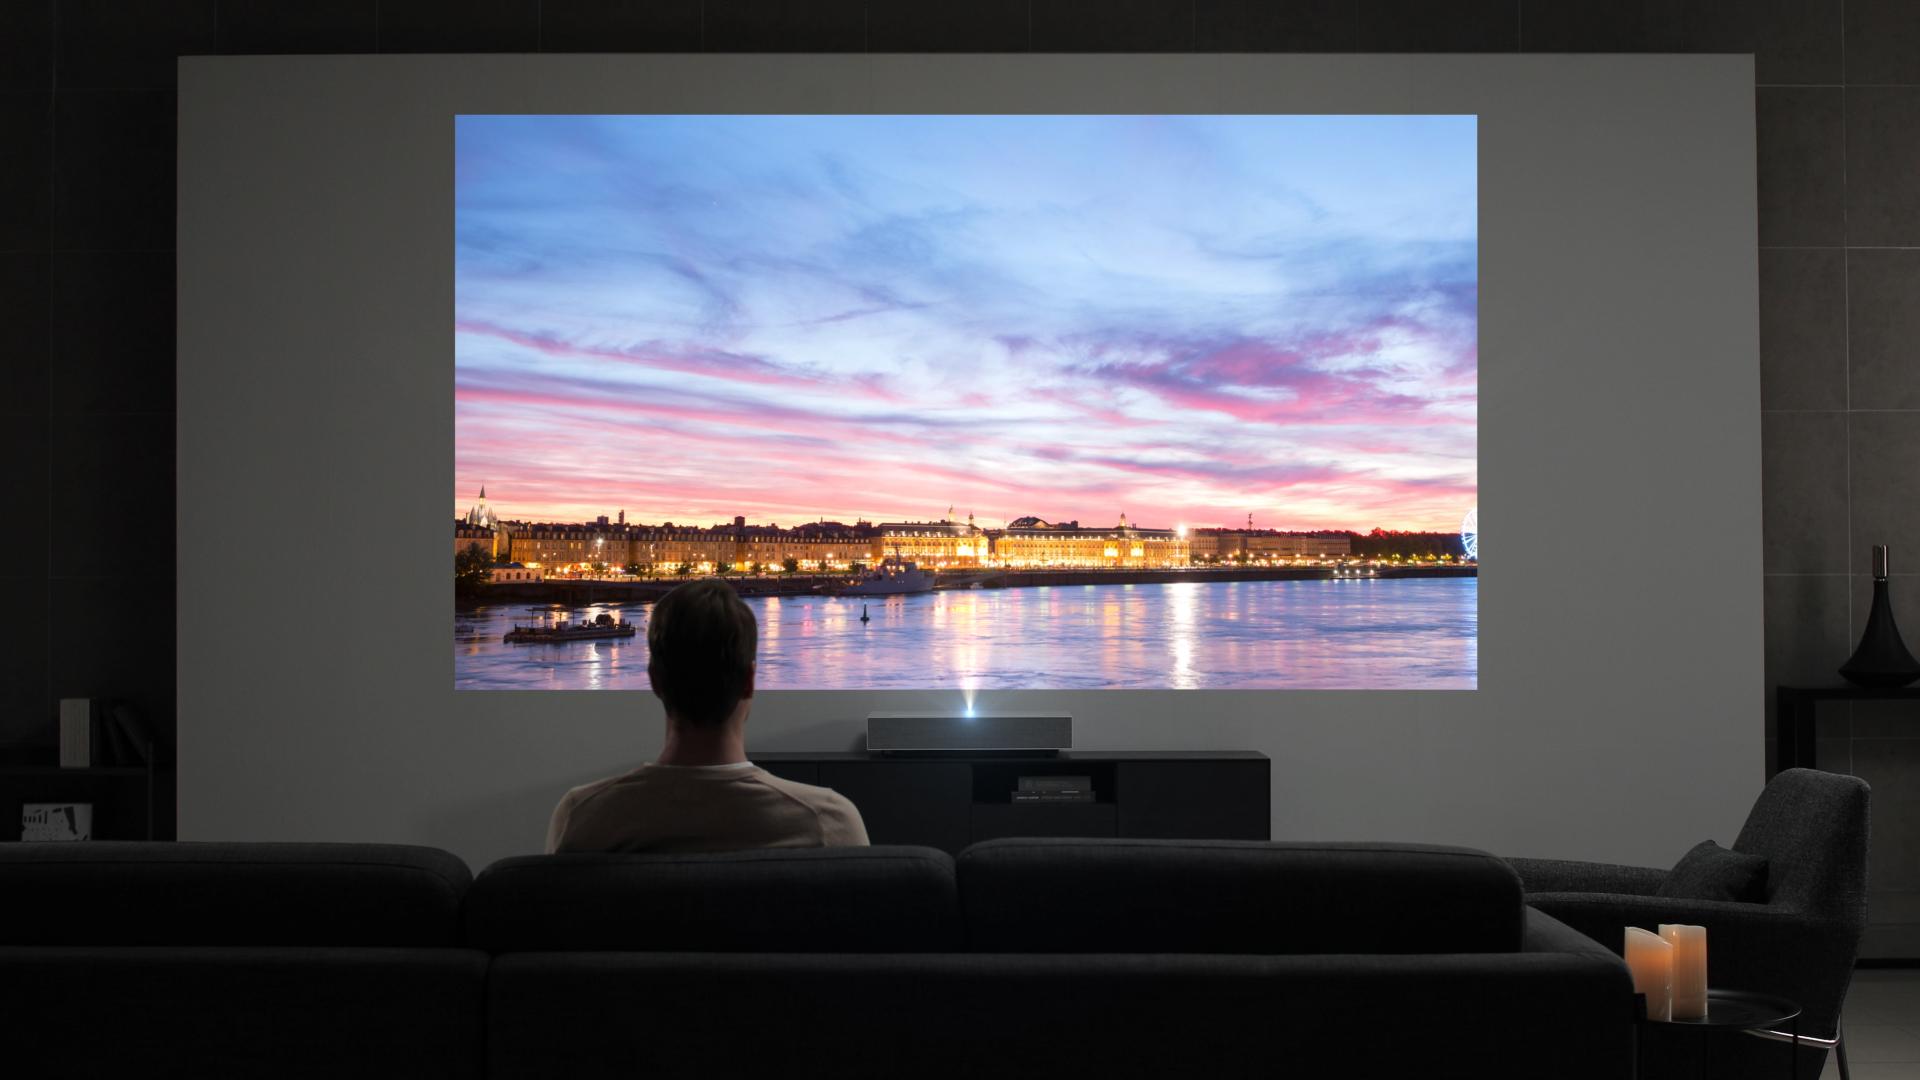 LG전자가 CES 2019에서 투사거리가 18cm만 확보되면 120인치 대화면을 UHD 해상도로 보여주는 'LG 시네빔 Laser 4K' 프로젝터를 공개한다.